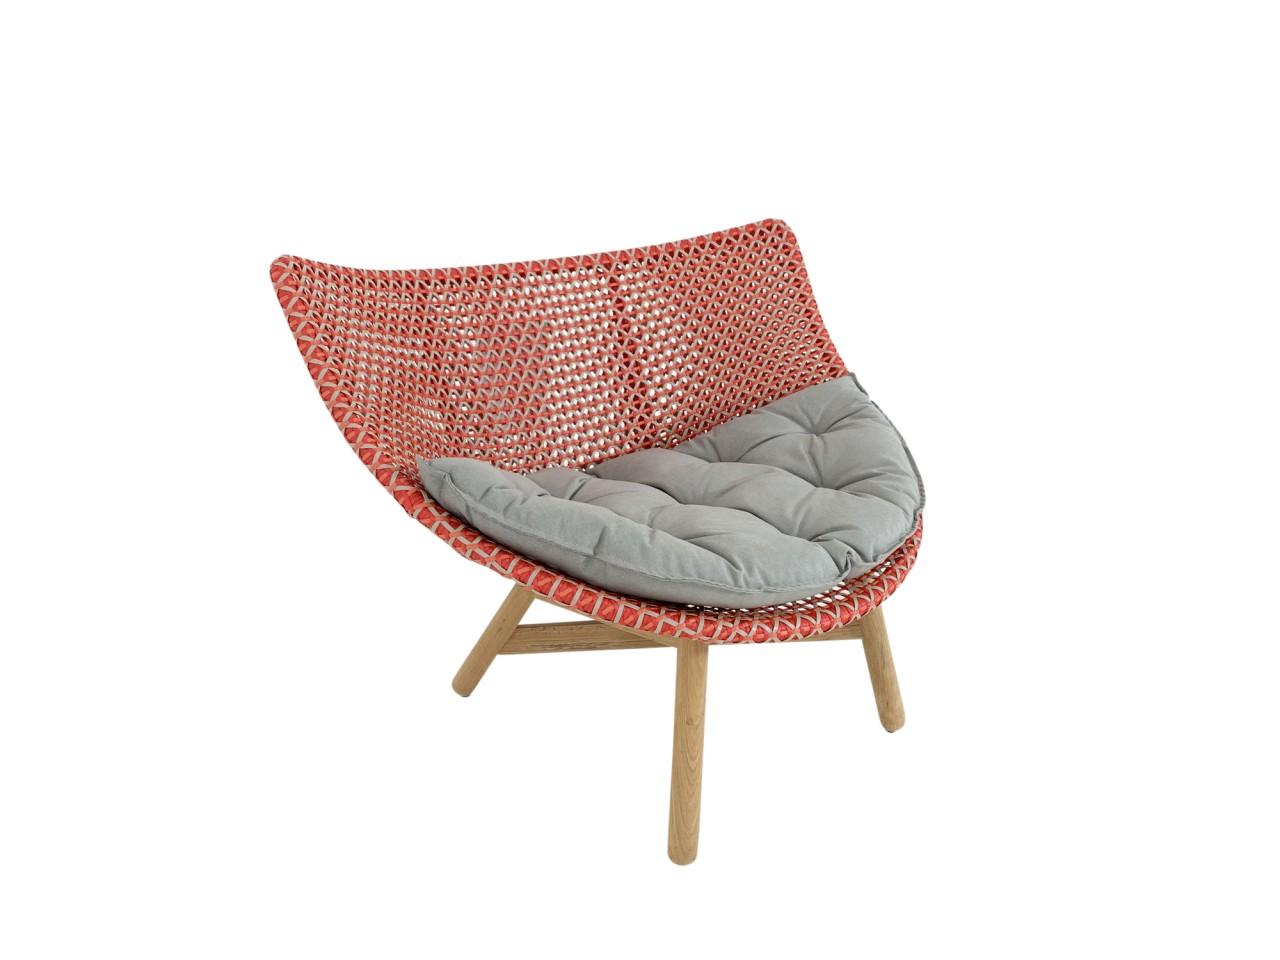 DEDON MBRACE LOUNGE CHAIR Sessel mit niedriger Lehne in spice mit Sitzkissen im Stoff cool taupe